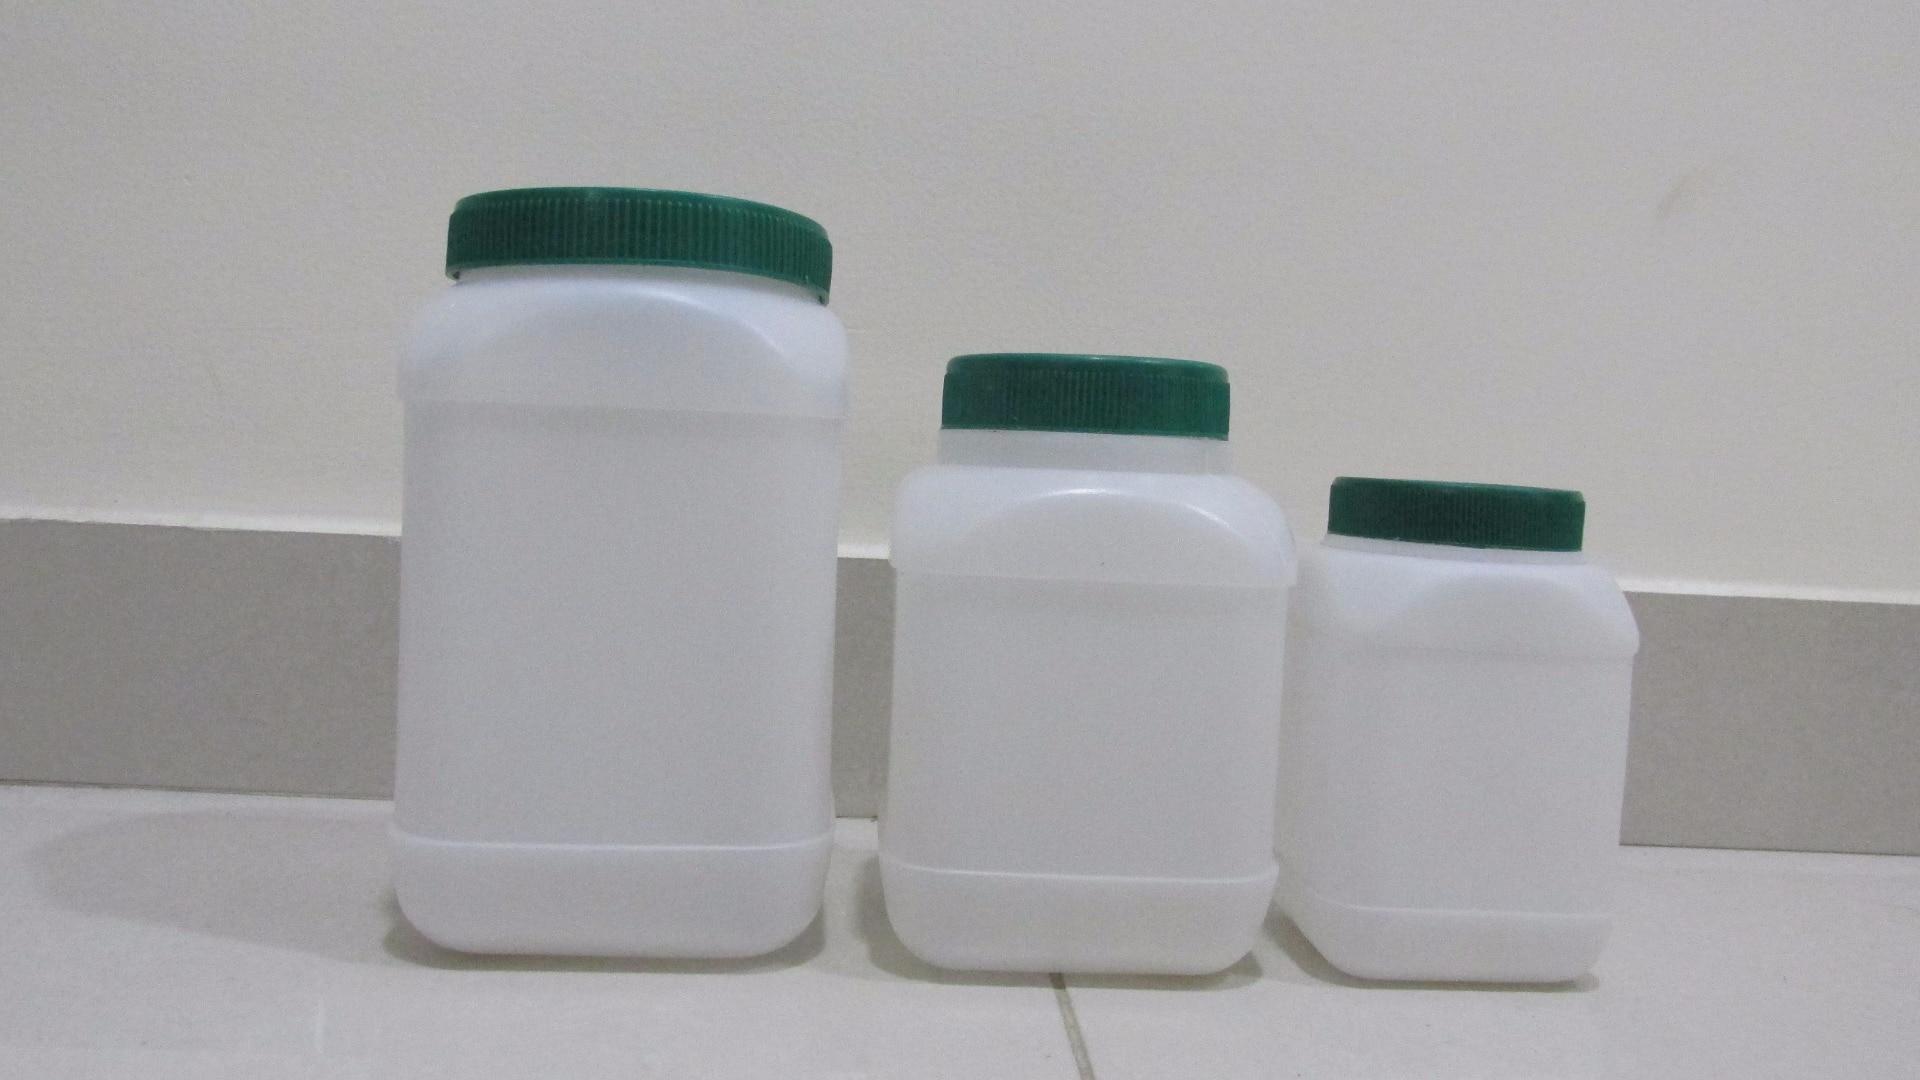 Kwality Plast